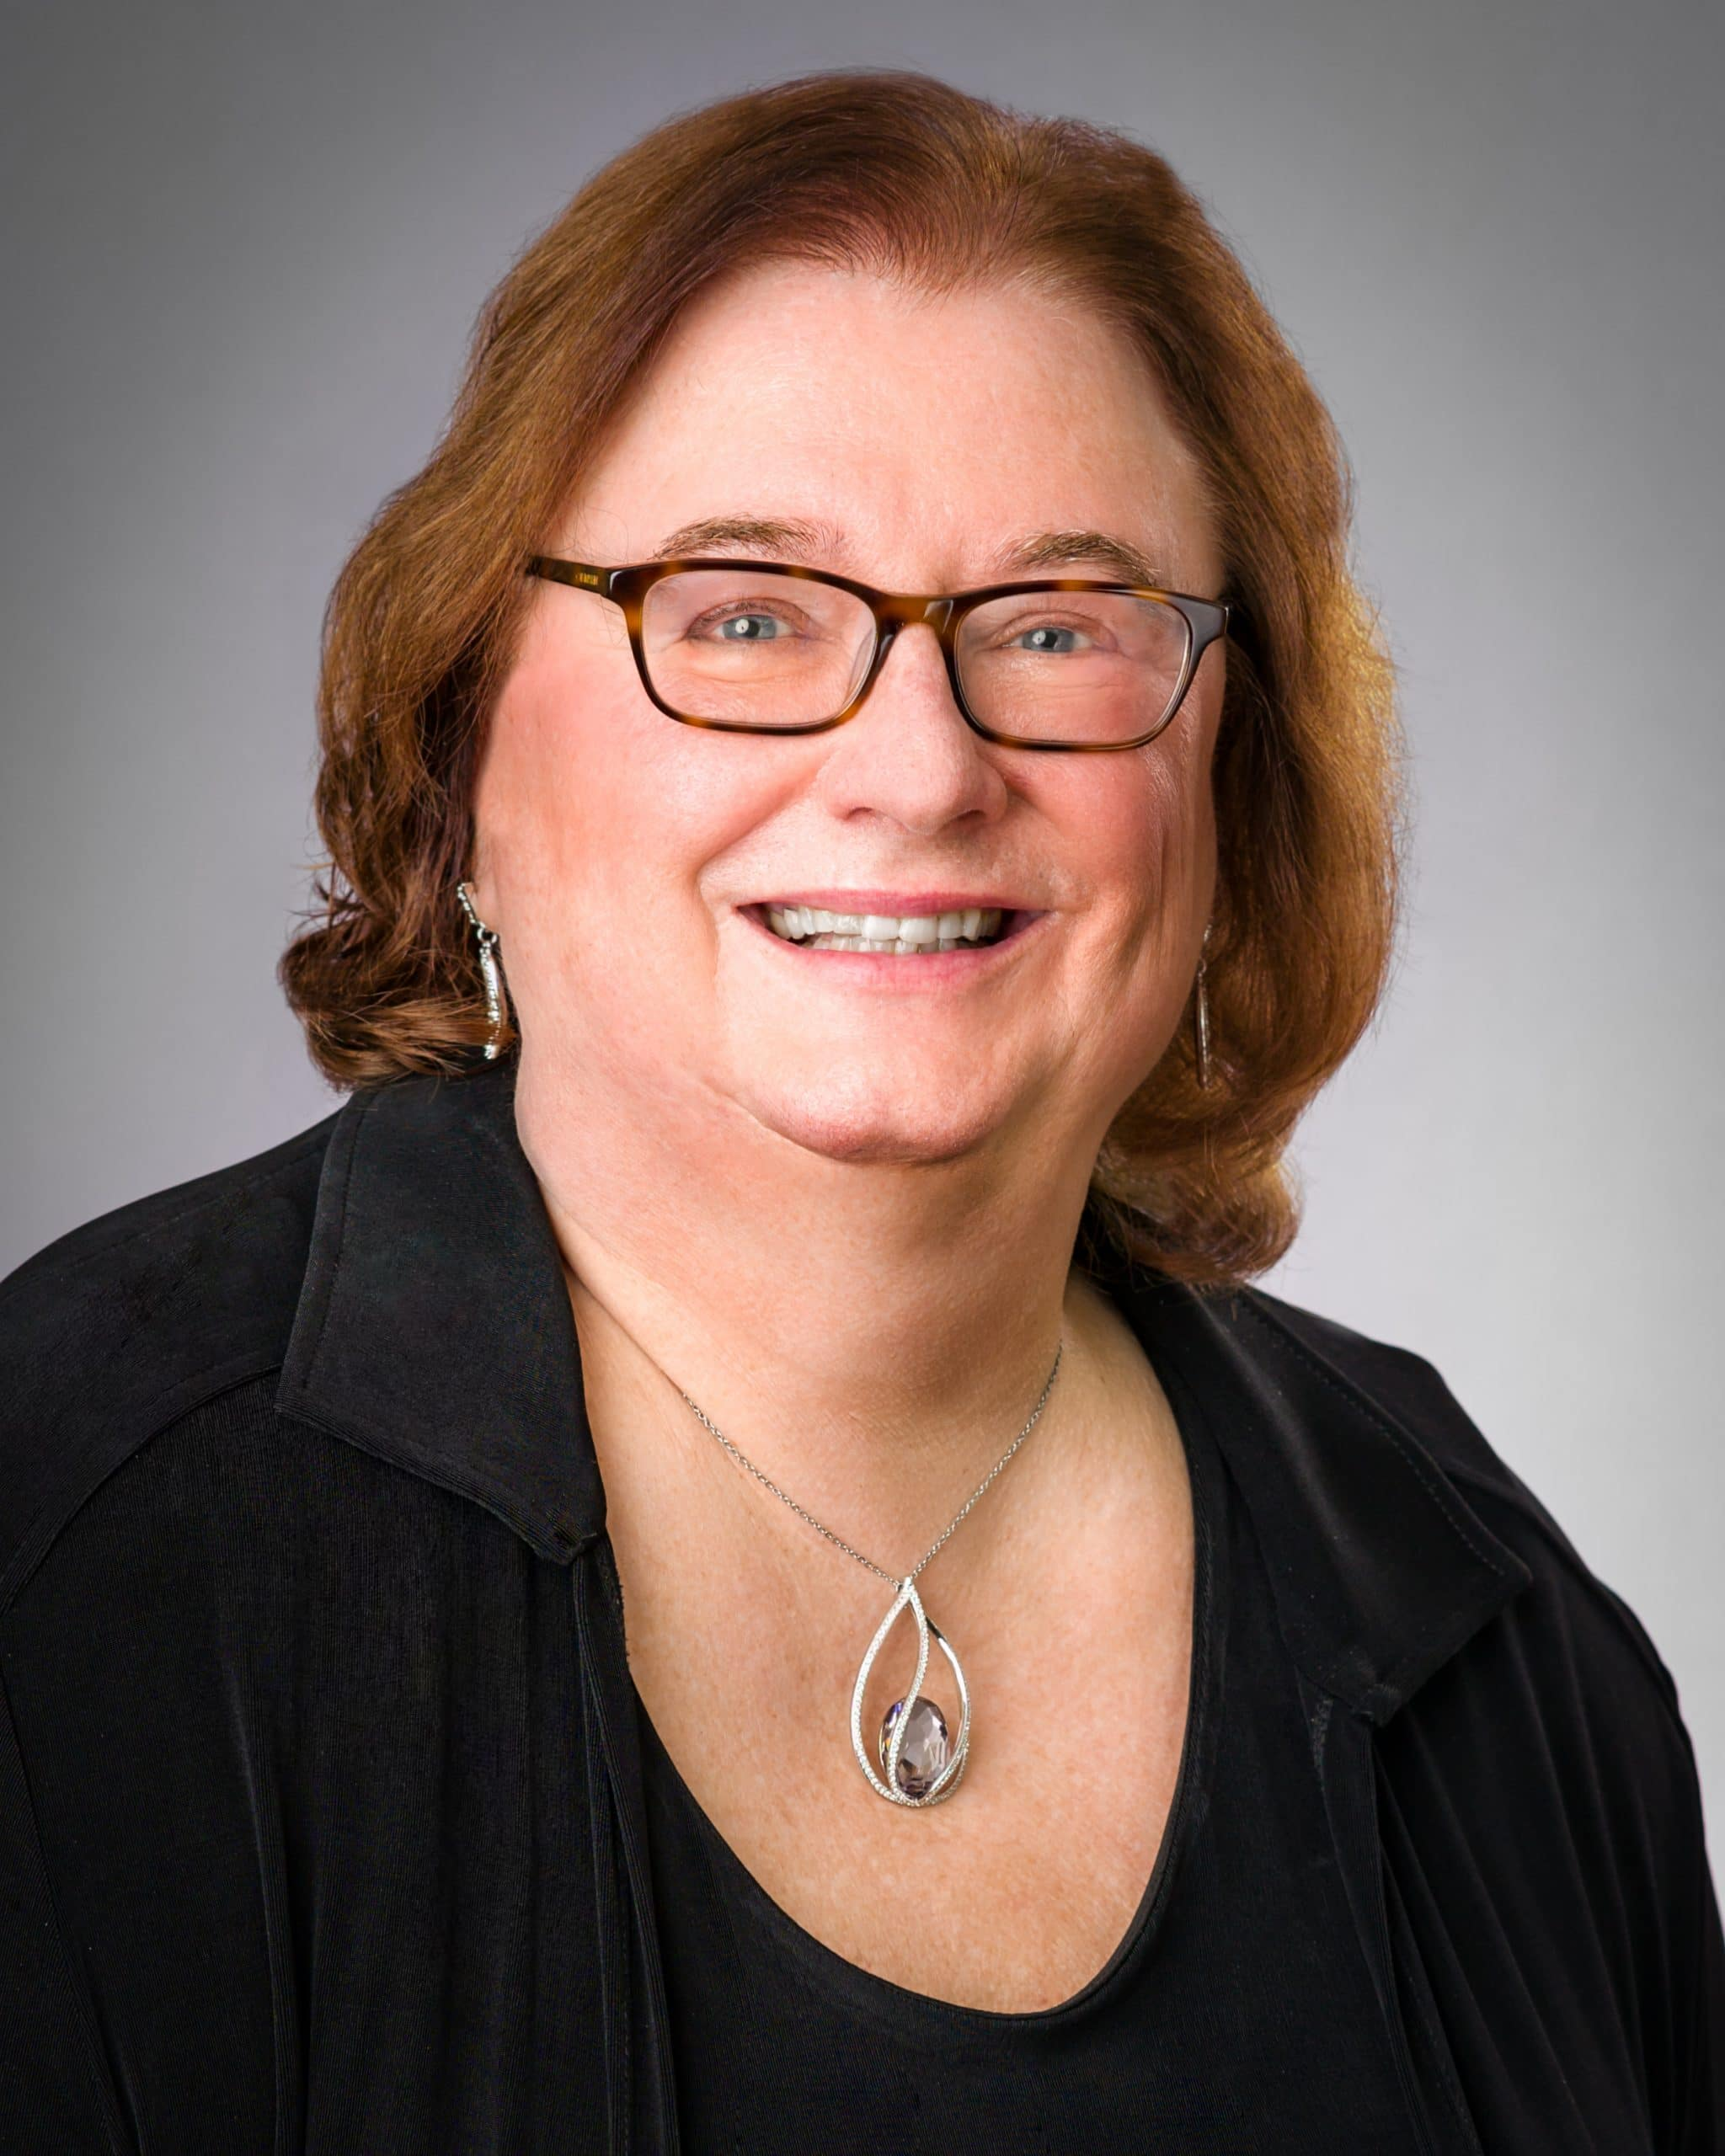 Sharon D. Nelson, Esq., President at Sensei Enterprises, Inc.